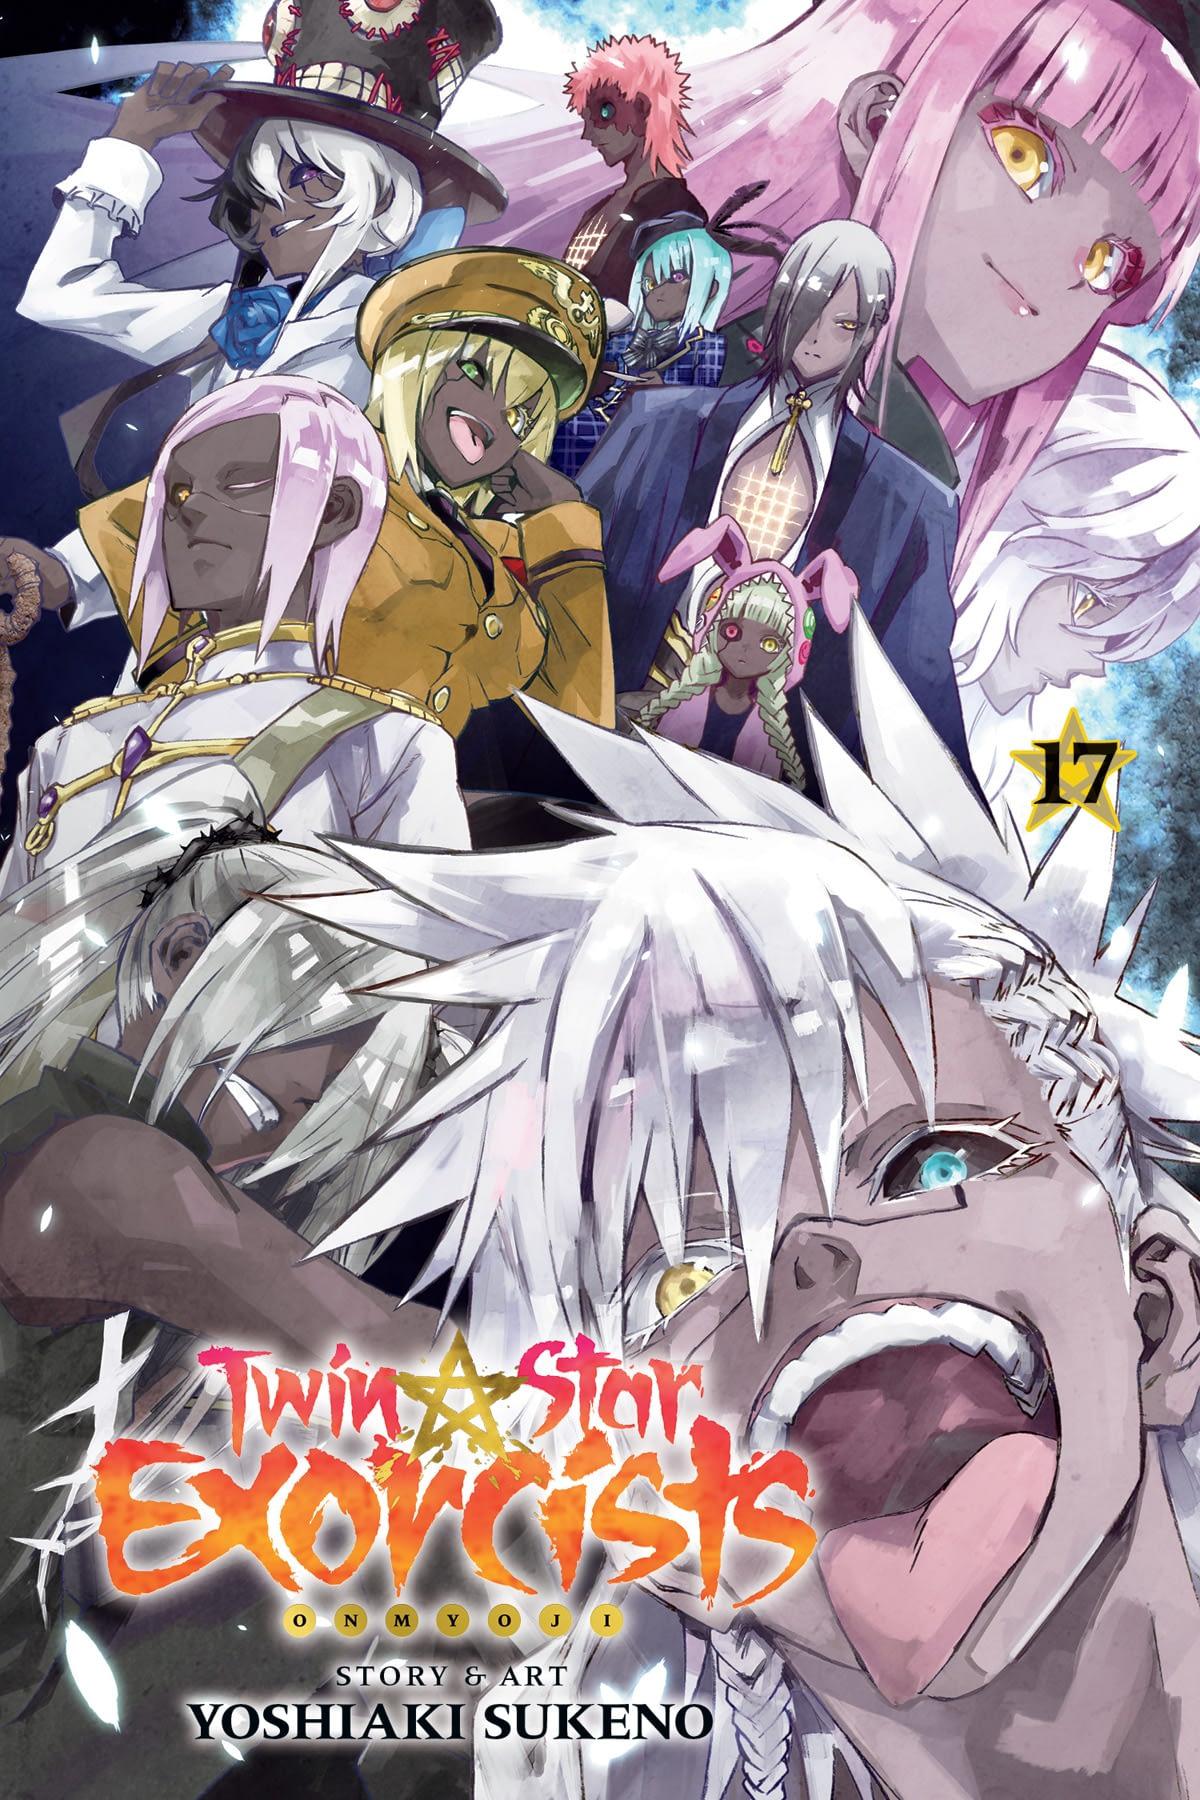 Best Selling Manga 2020.Viz Media Unveils List Of February 2020 Manga Releases